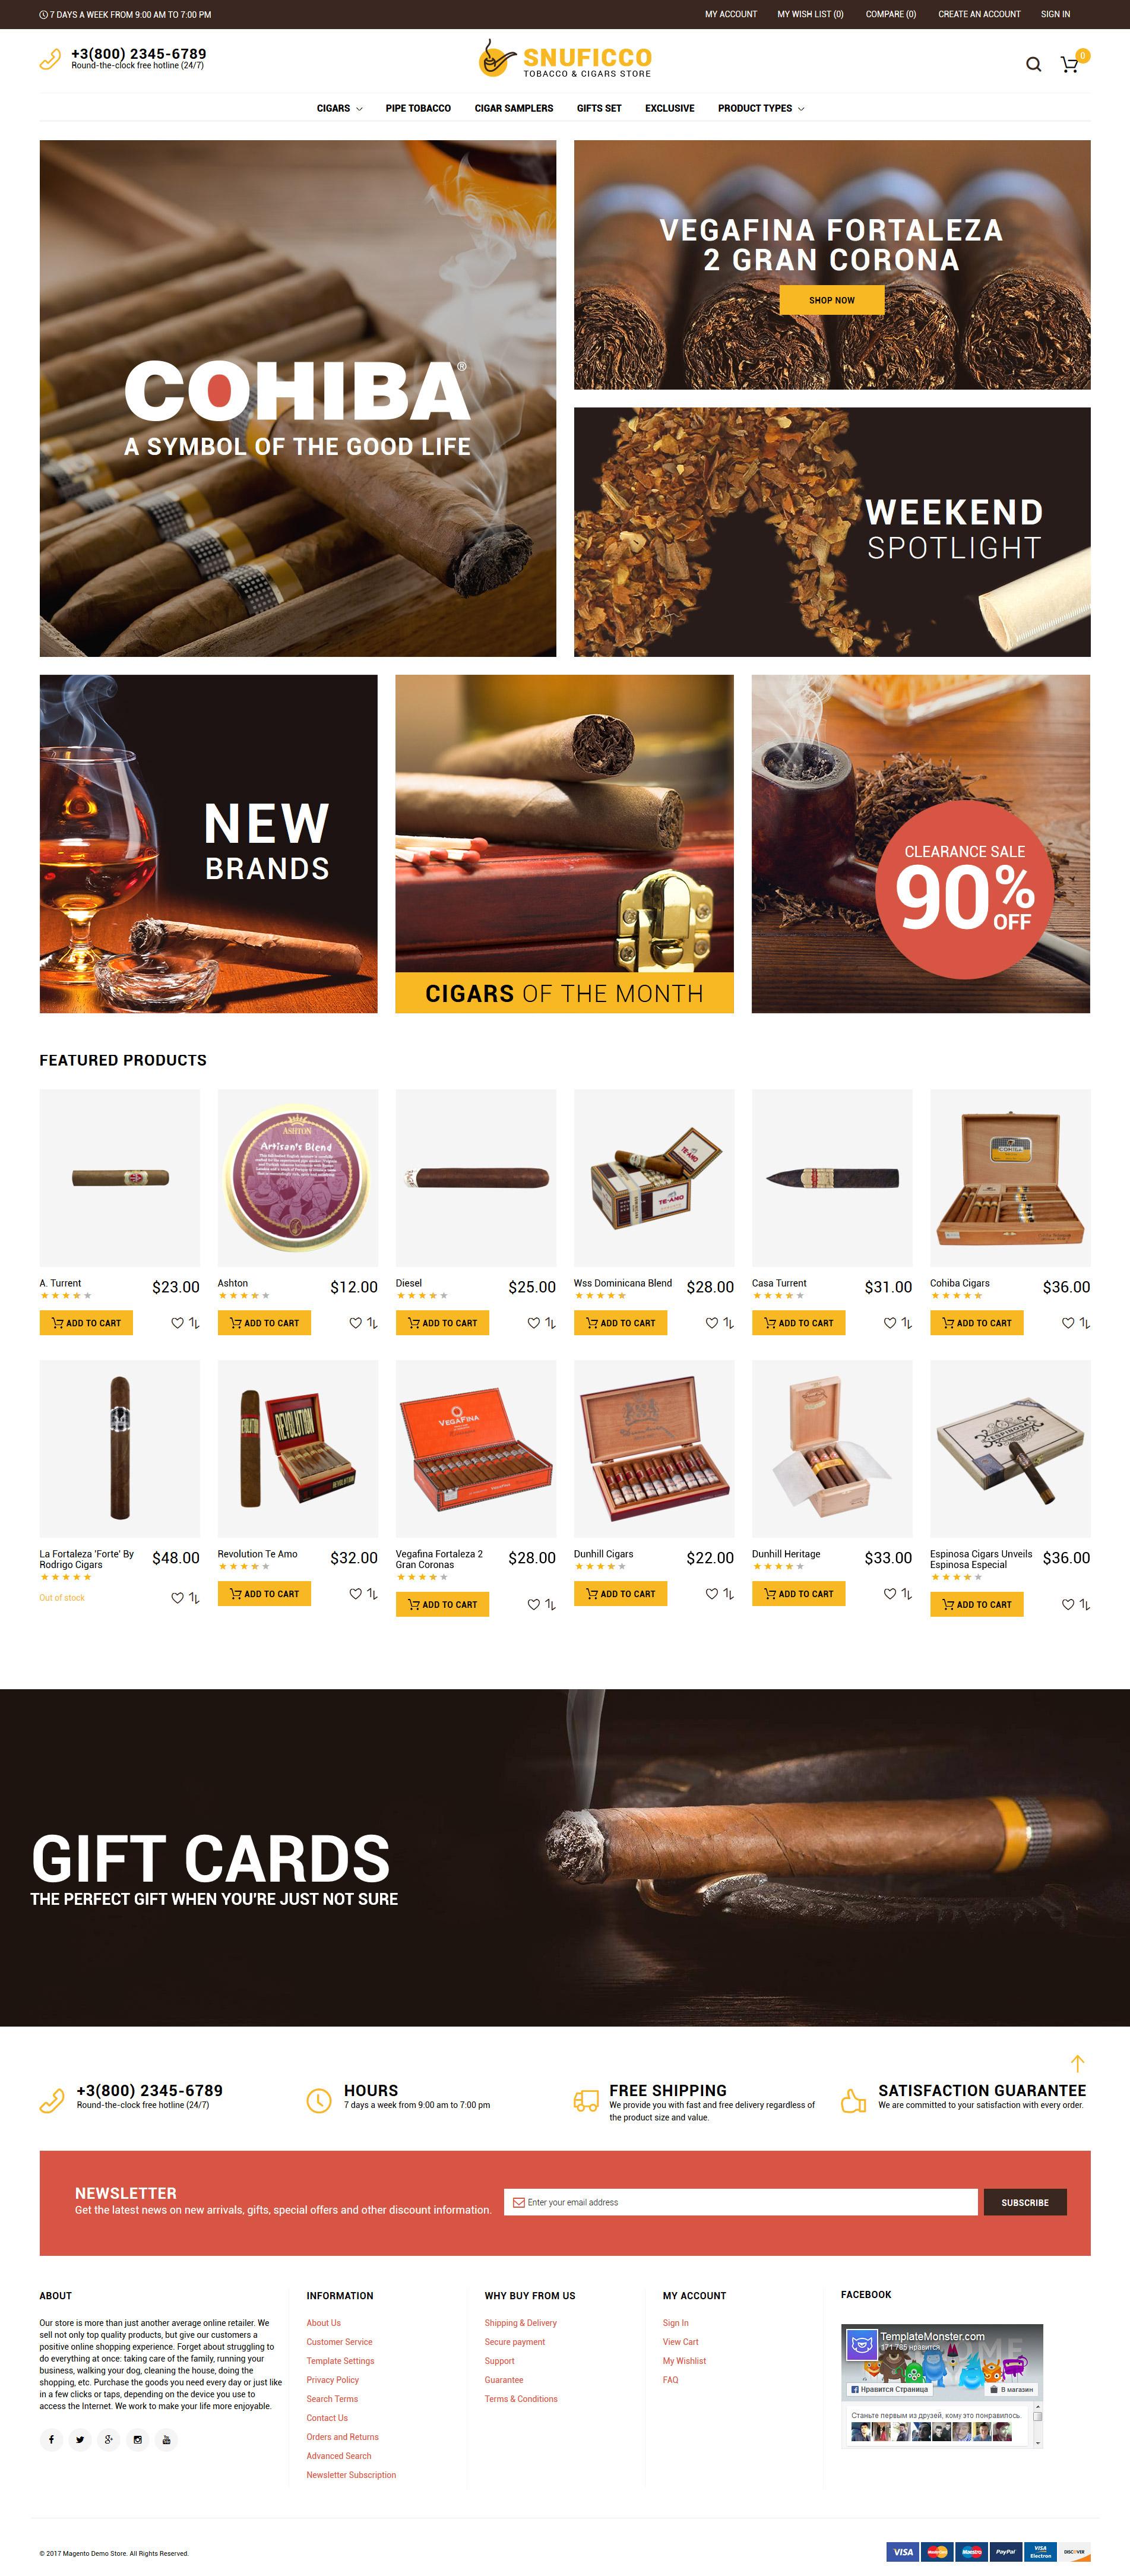 Snuficco - Tobacco & Cigars Store Responsive Magento 2 Theme Magento Theme